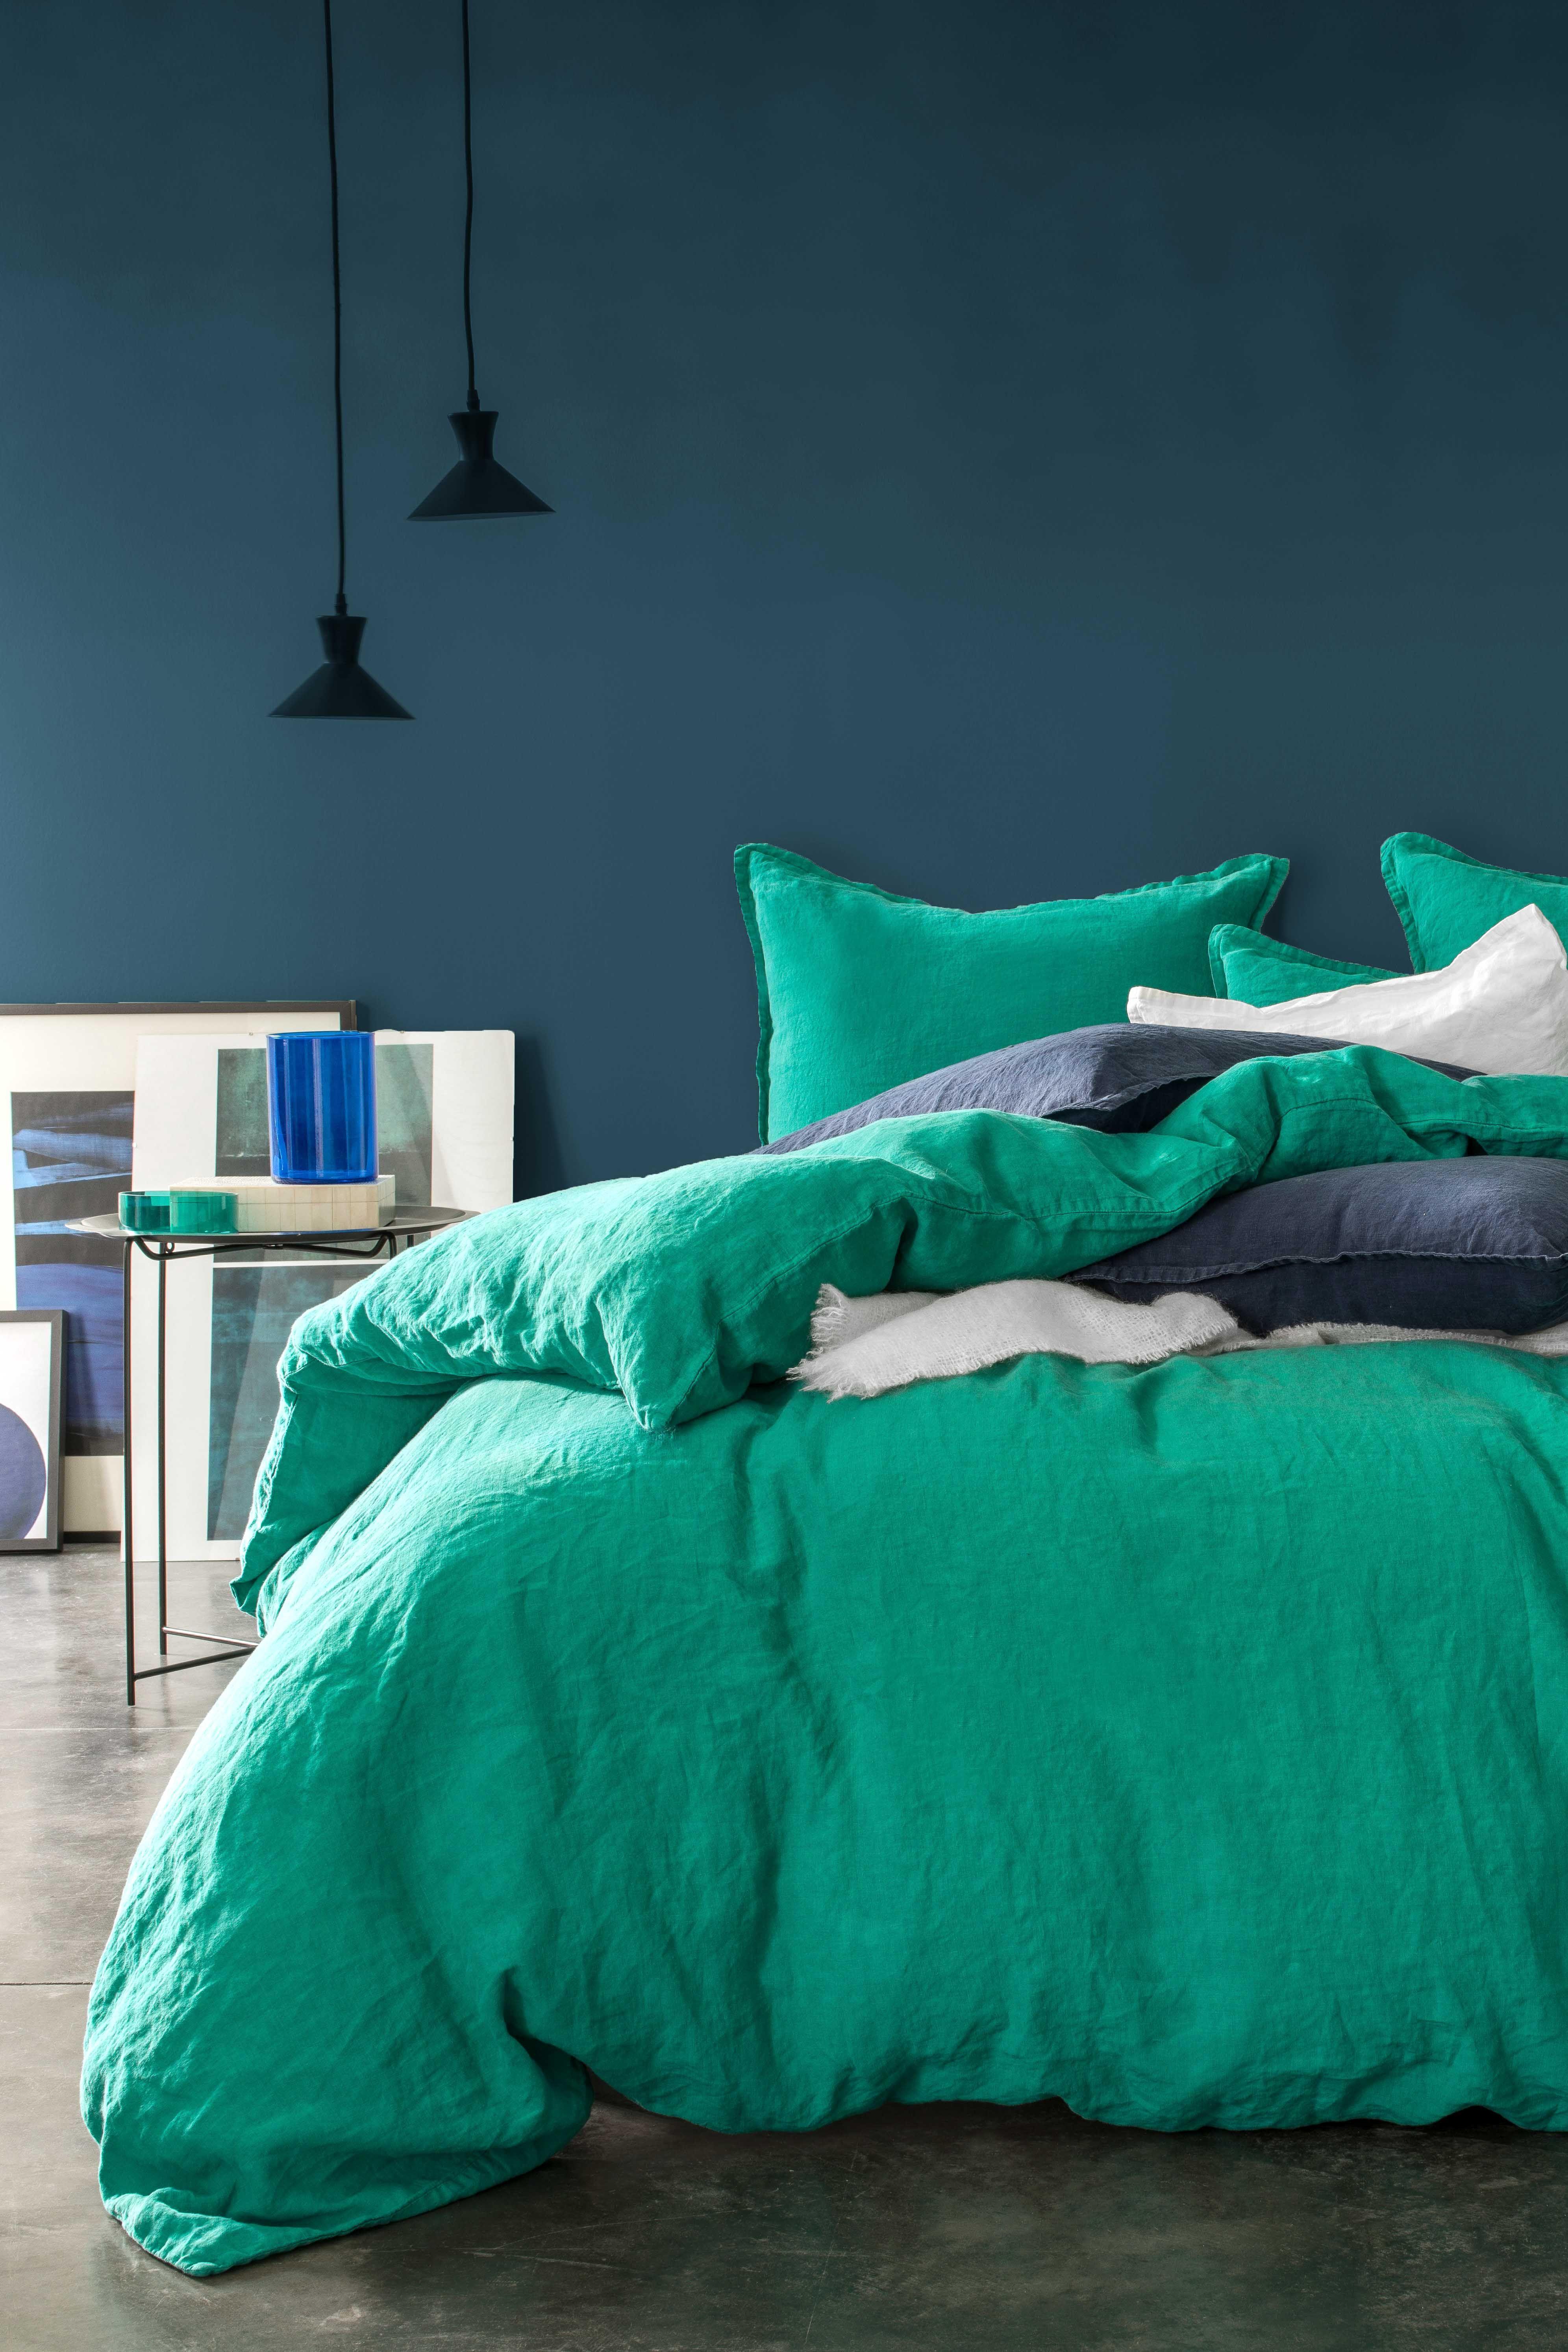 vert meraude couleur vert meraude couleur with vert meraude couleur gallery of chaussure. Black Bedroom Furniture Sets. Home Design Ideas